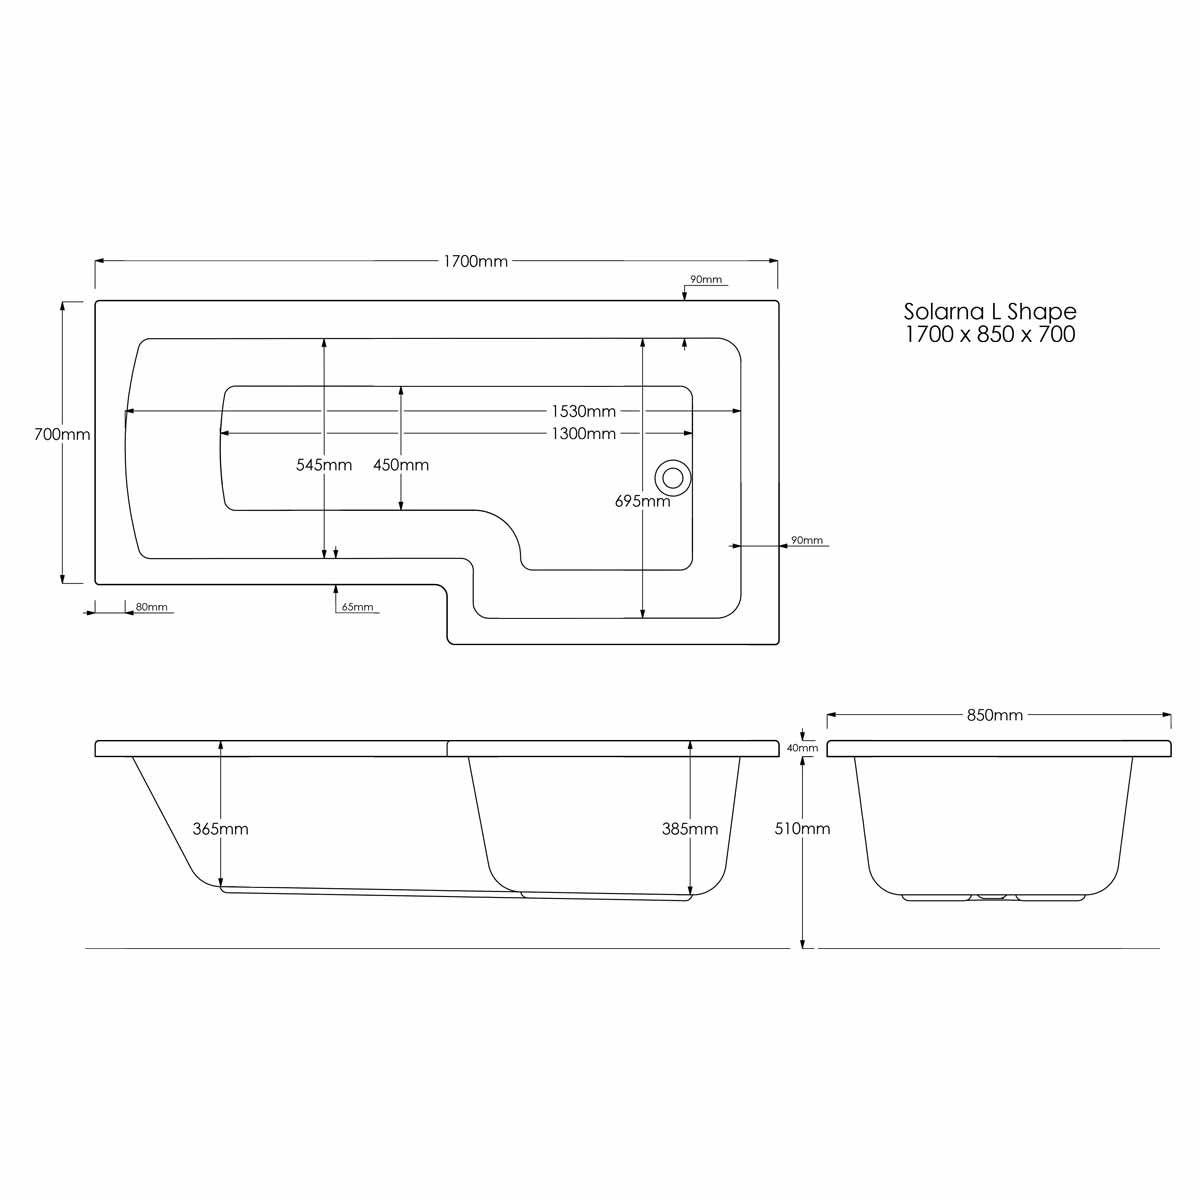 Solarna L Shape Shower Bath 1700 x 850 Left Hand Dimensions